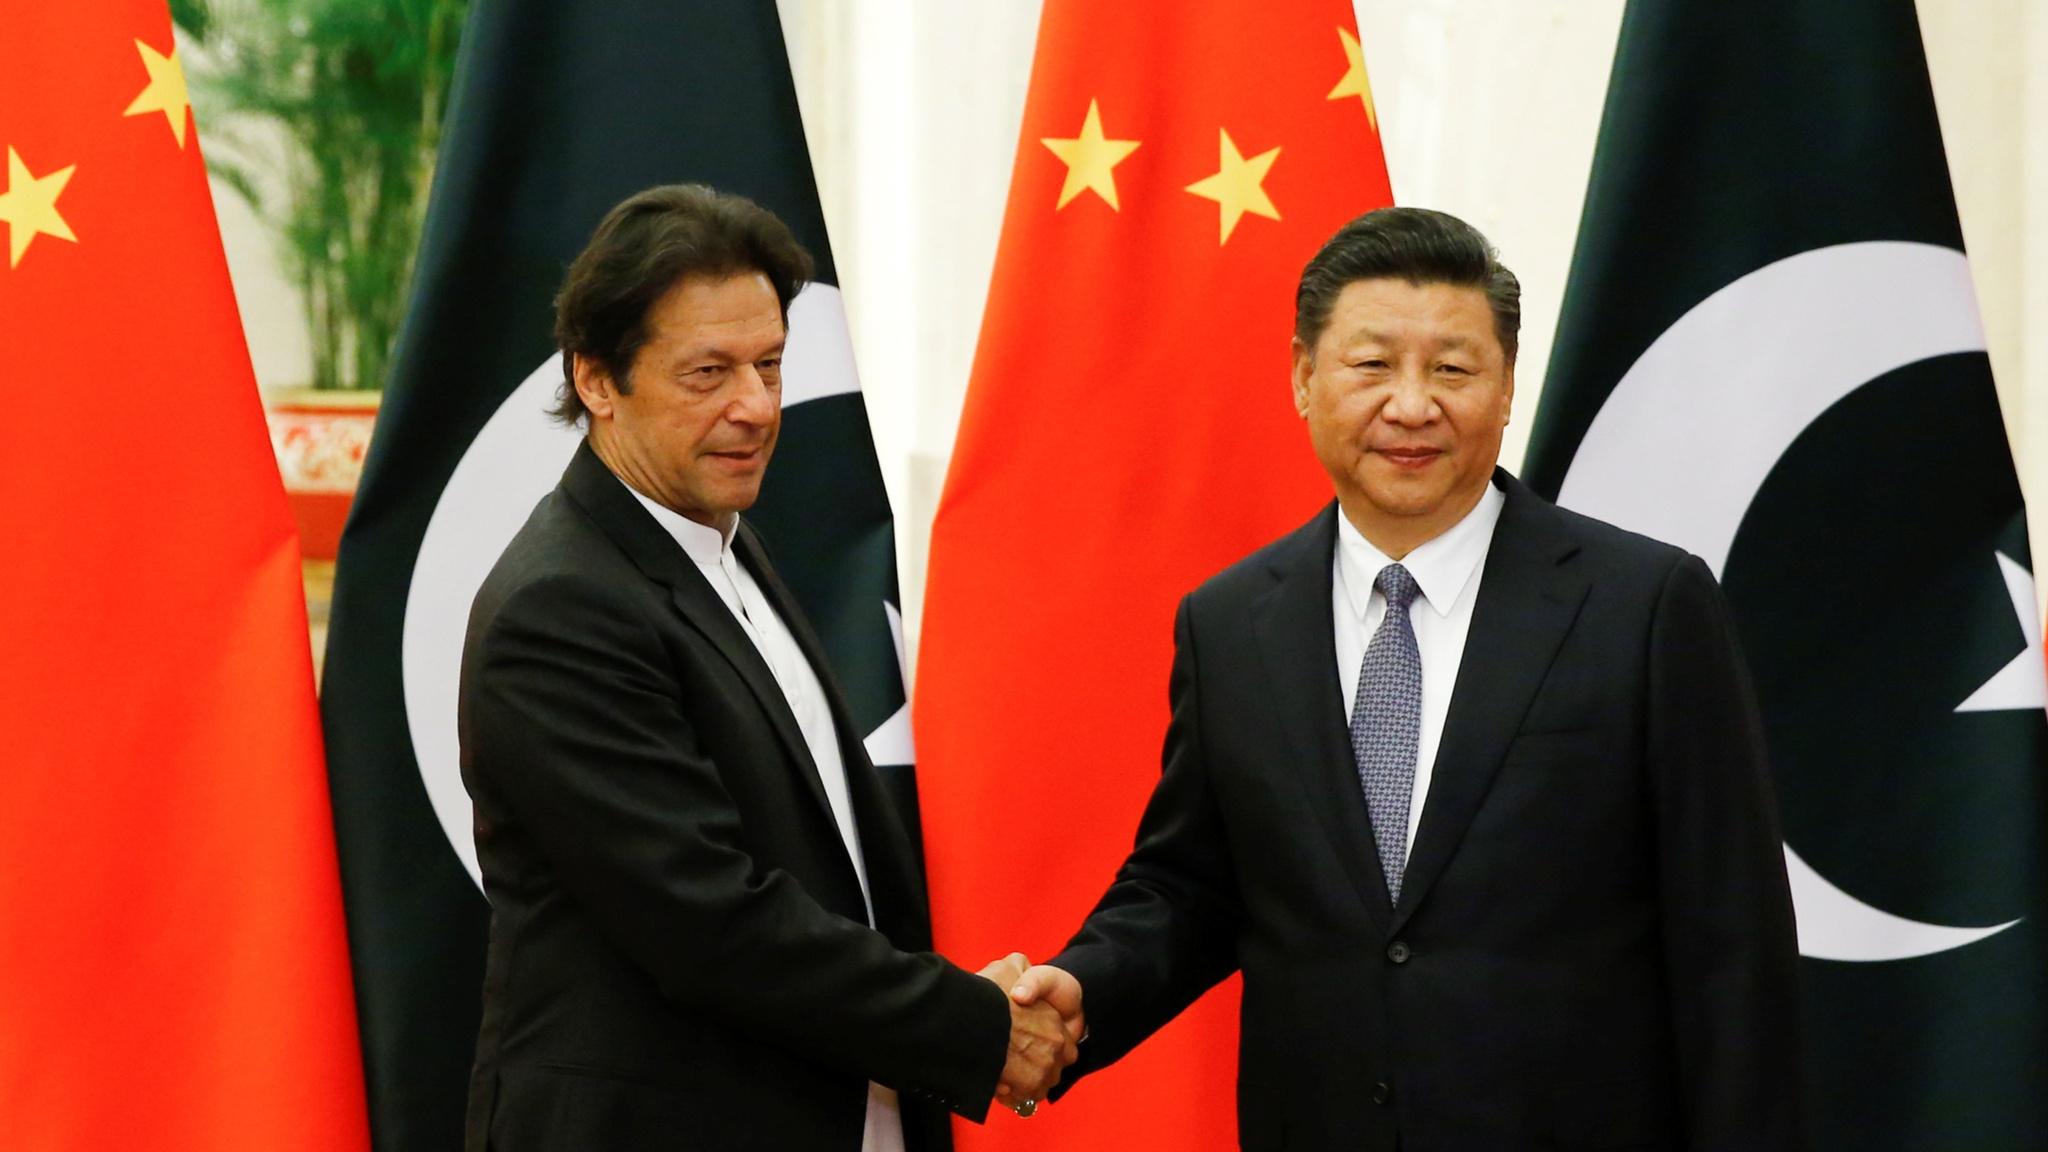 nikkei.com - Brahma Chellaney - Pakistan, China and terrorism